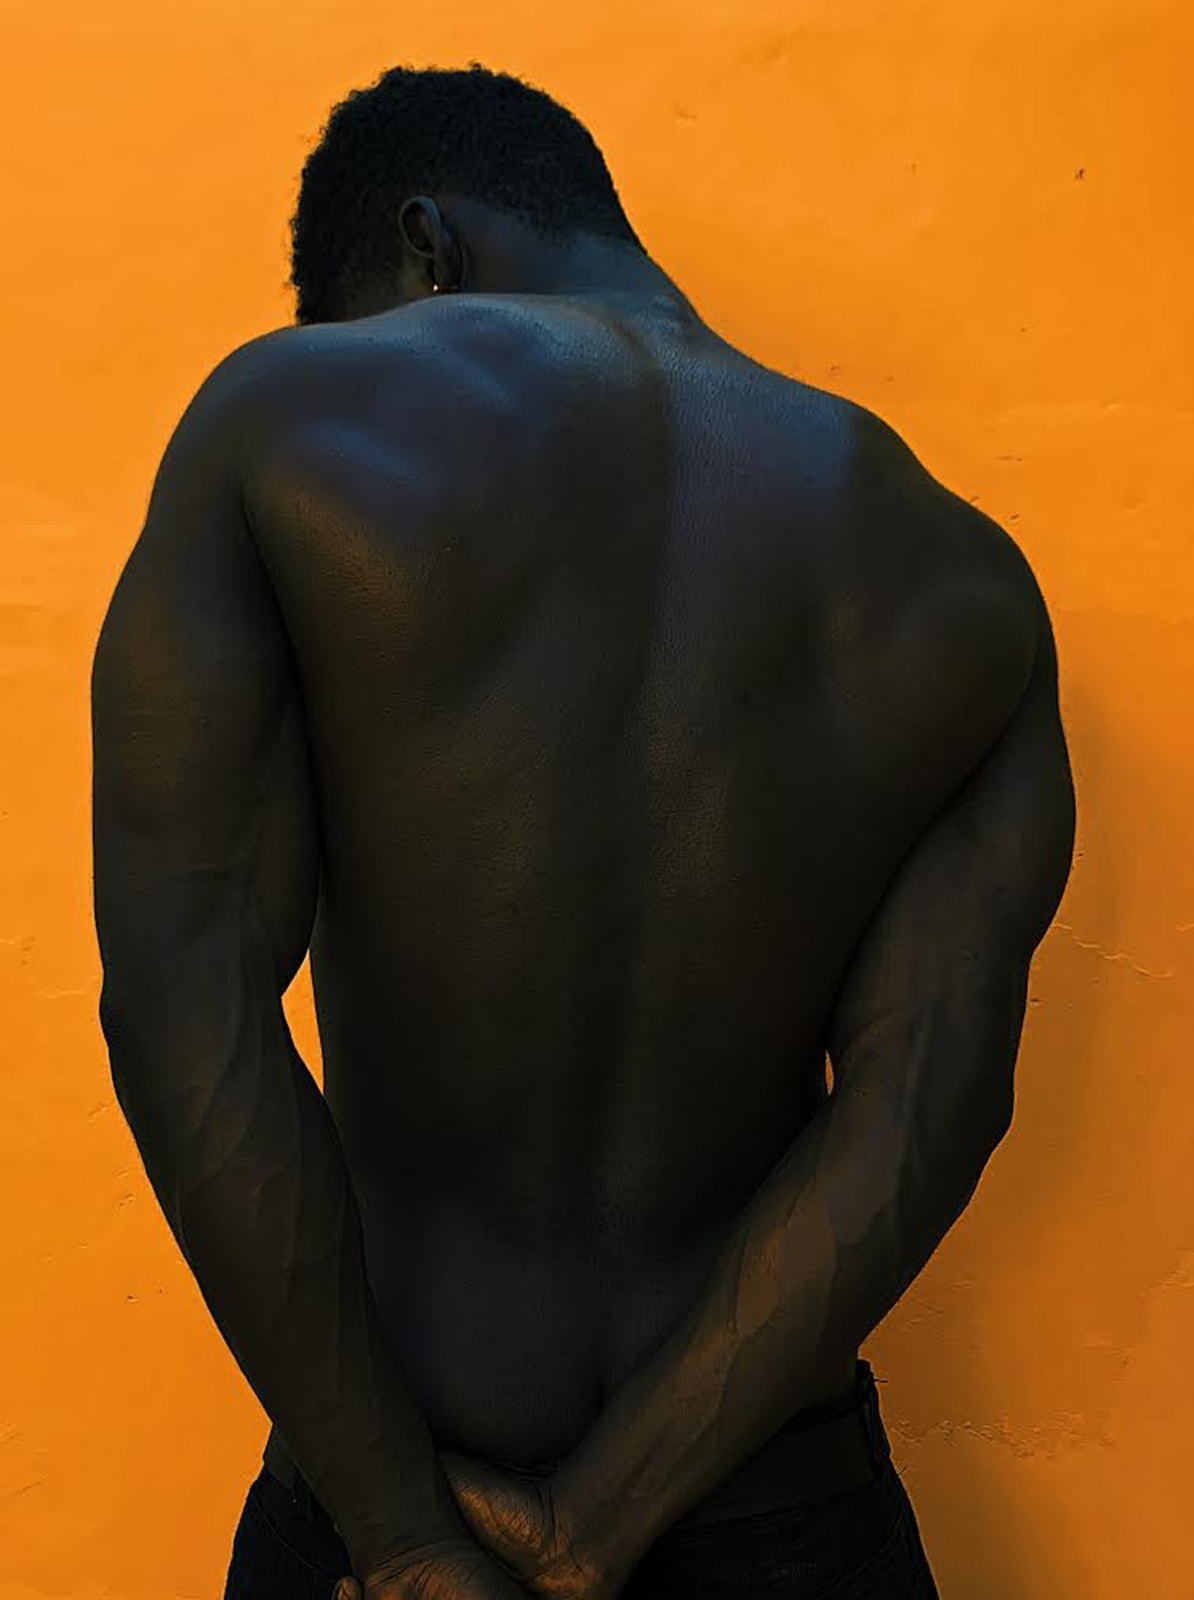 Joseph Abbey-Mensah Orange Chocolate 42 x 56.24 cm 29.7 x 39.81 cm 21 x 27.98 cm Digital print